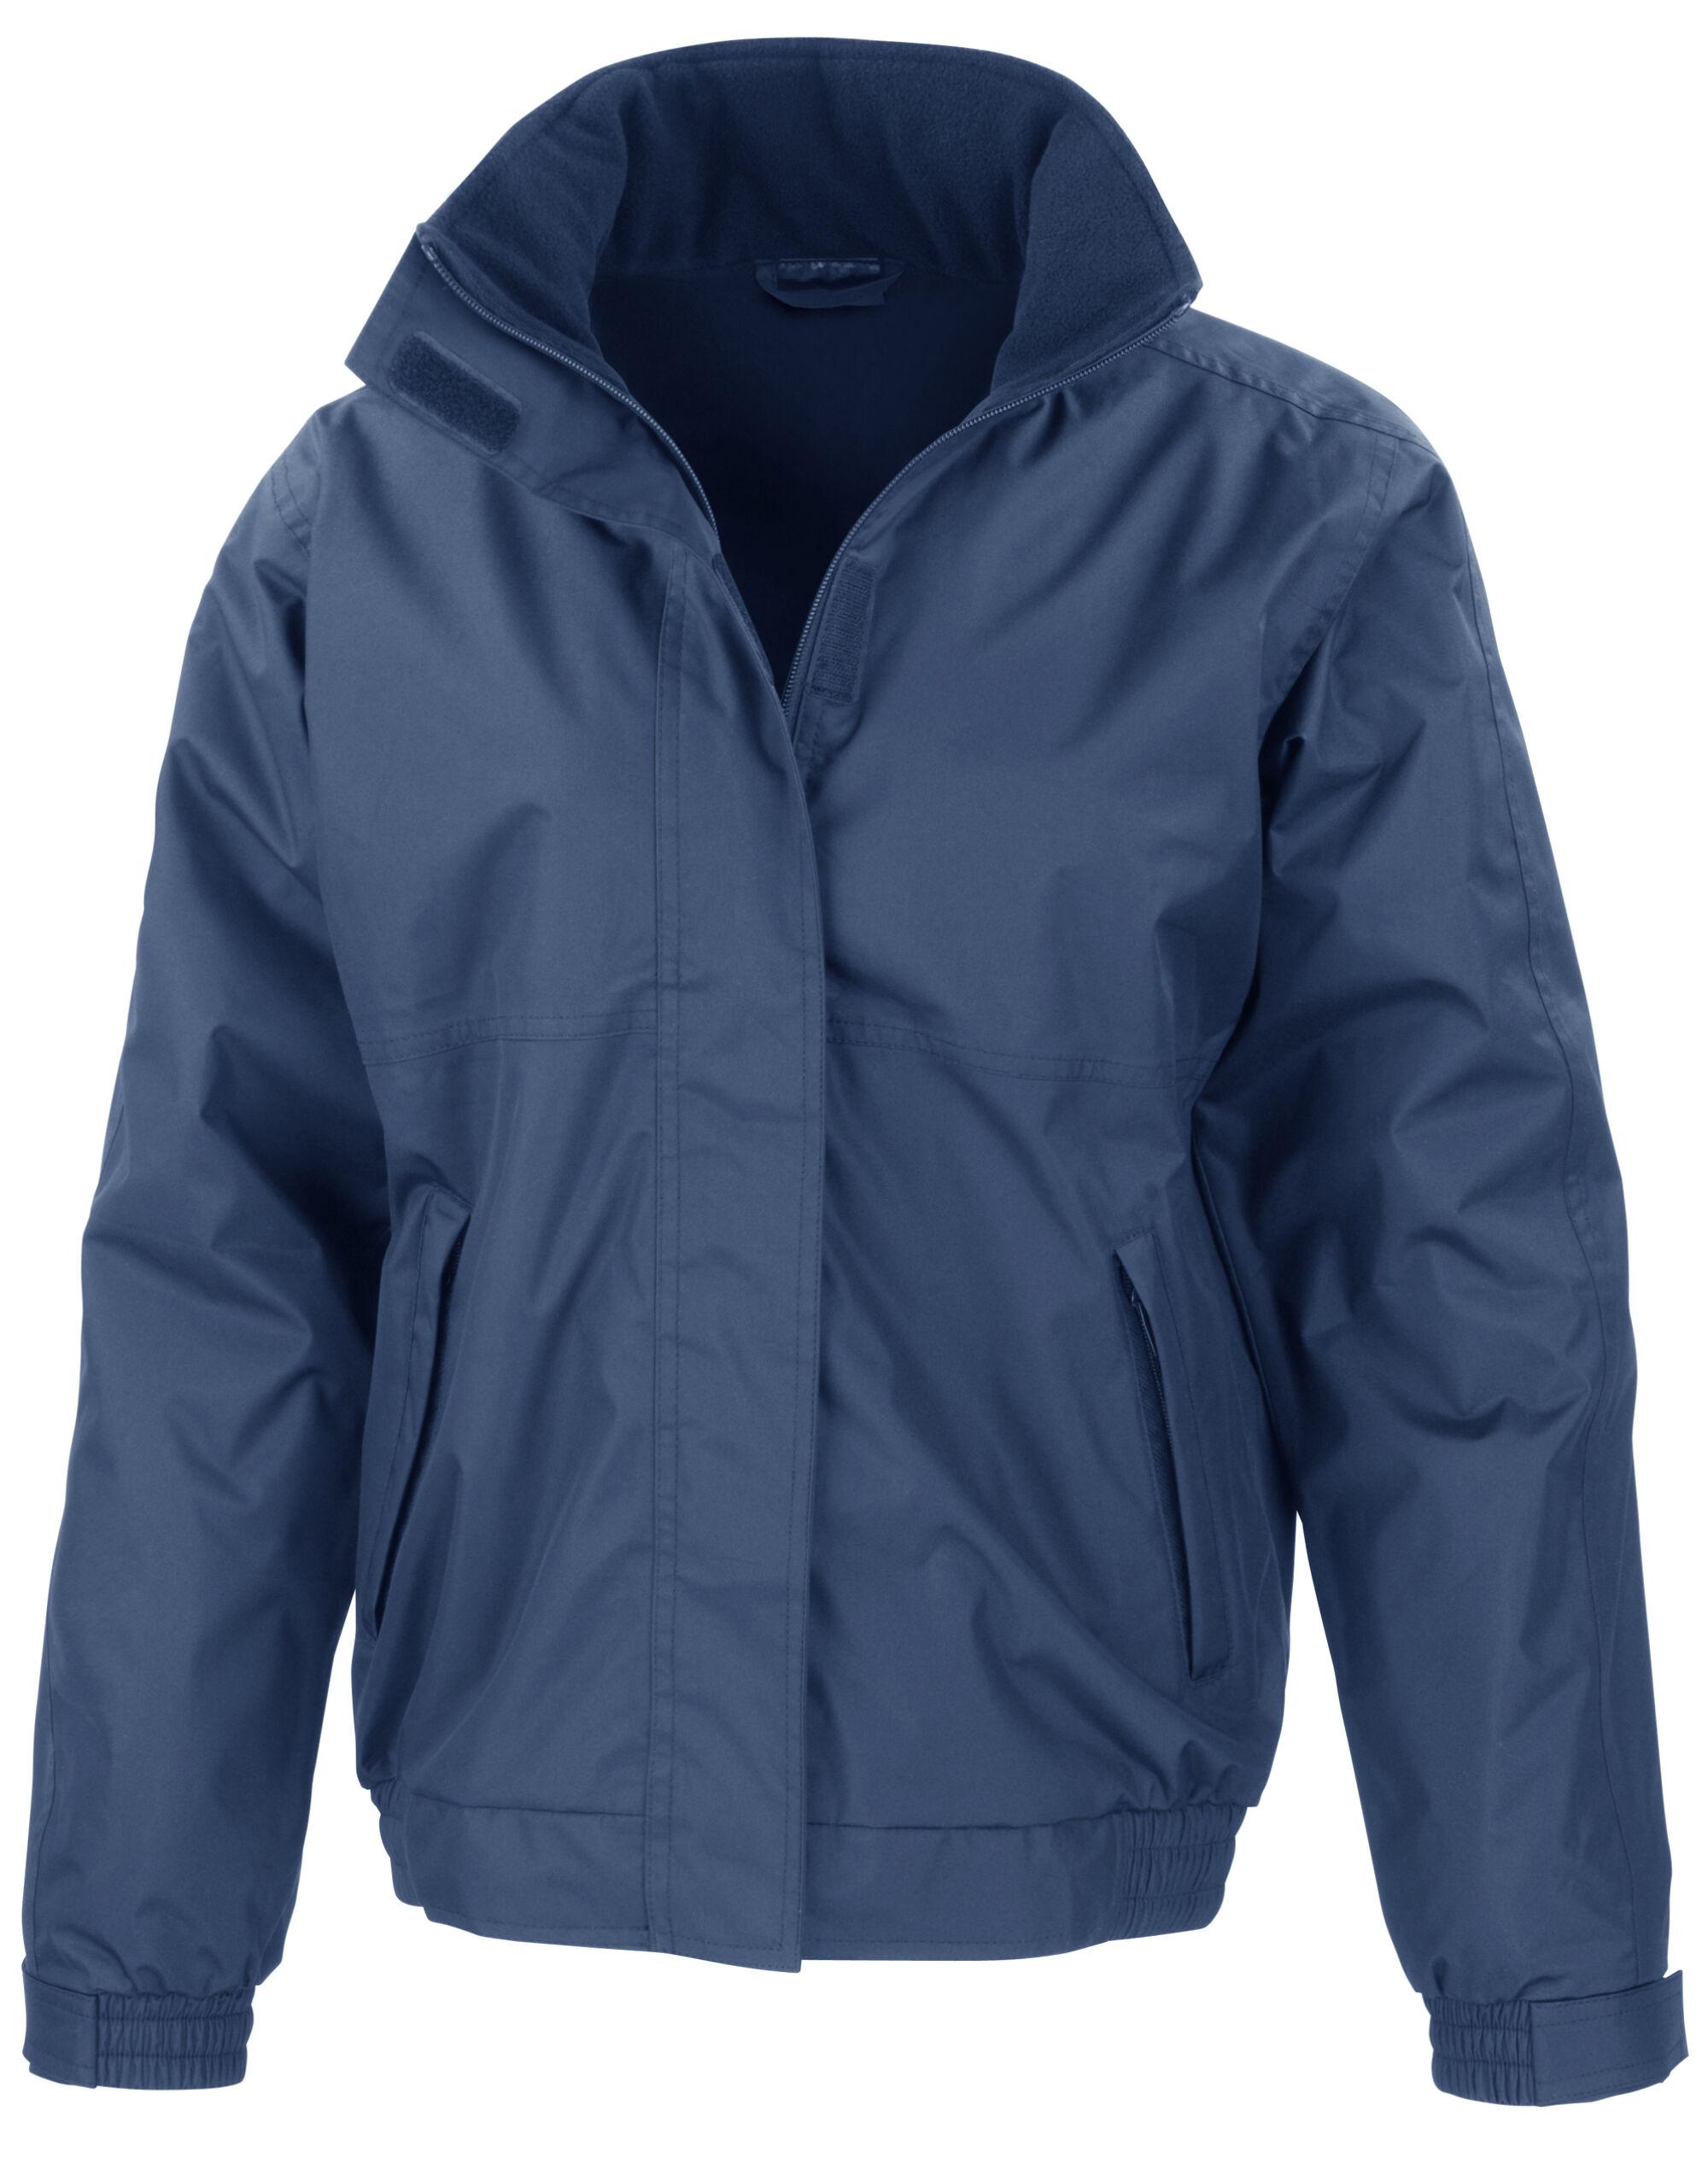 Core Men's Channel Jacket